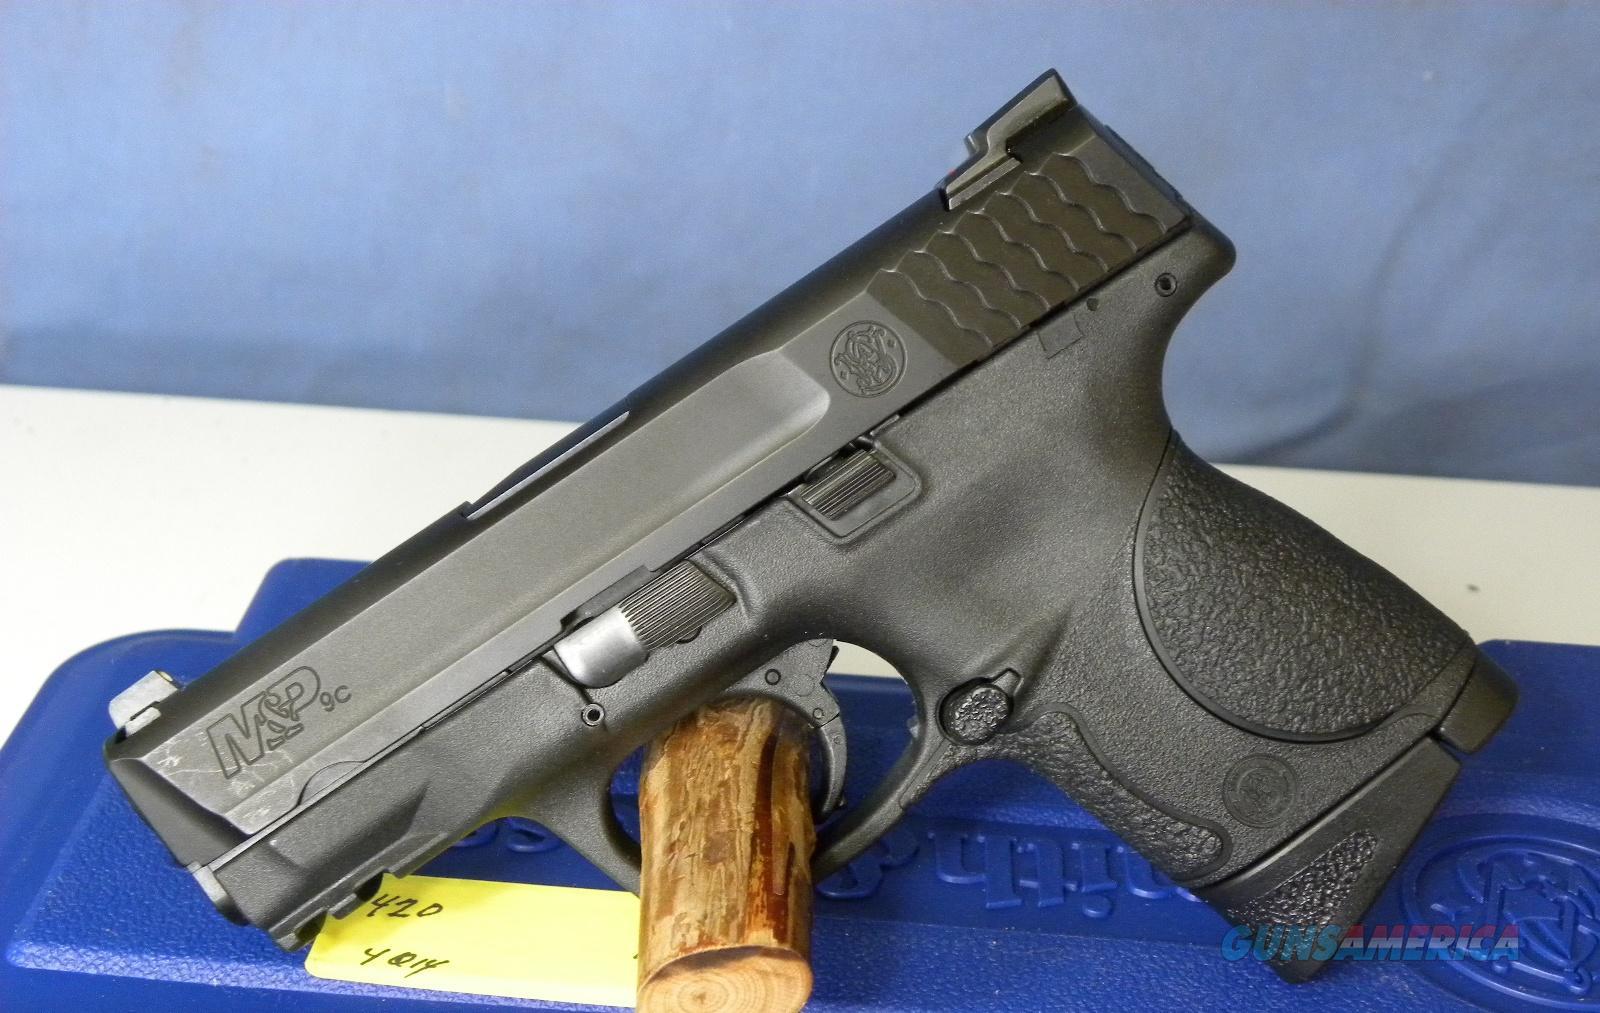 S&W M&P 9mm Compact TALO 150954  Guns > Pistols > Smith & Wesson Pistols - Autos > Polymer Frame